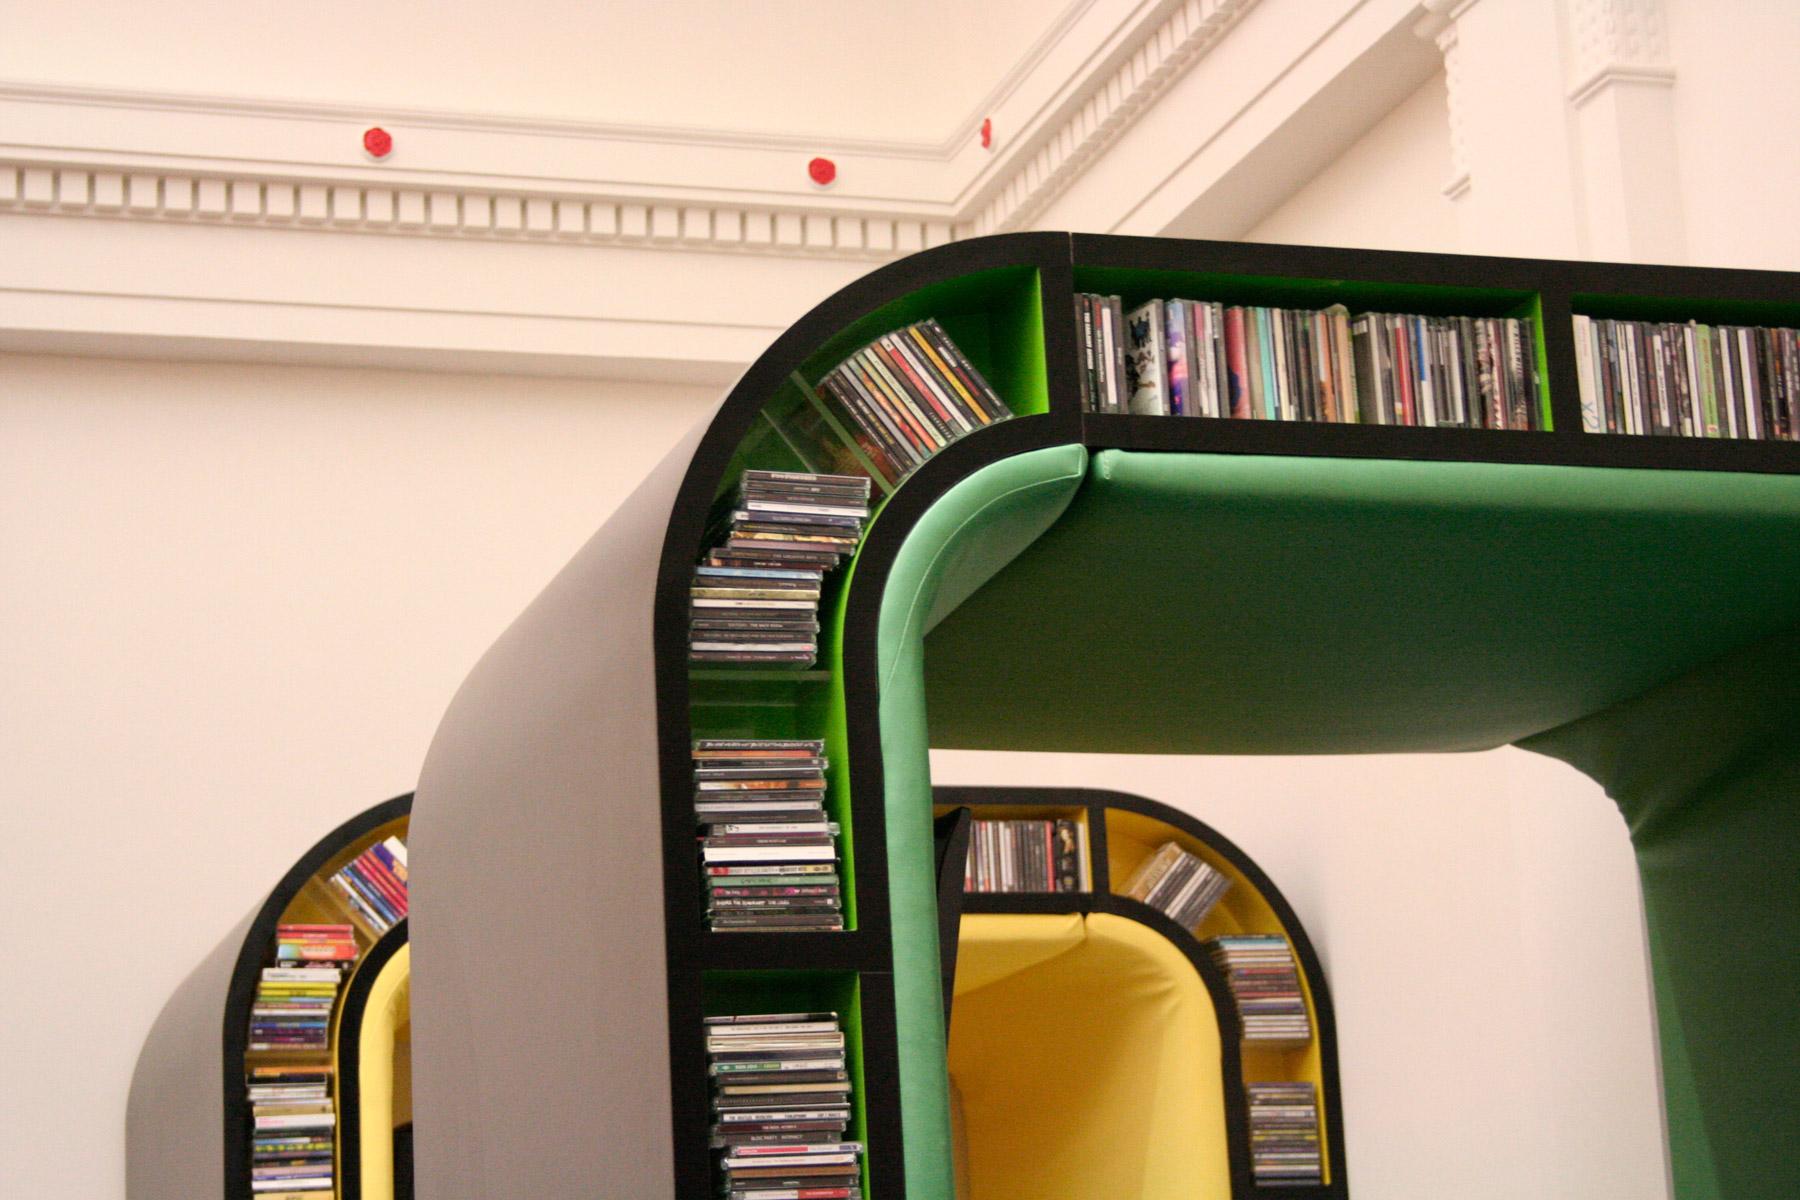 burnley-library_image-6.jpg